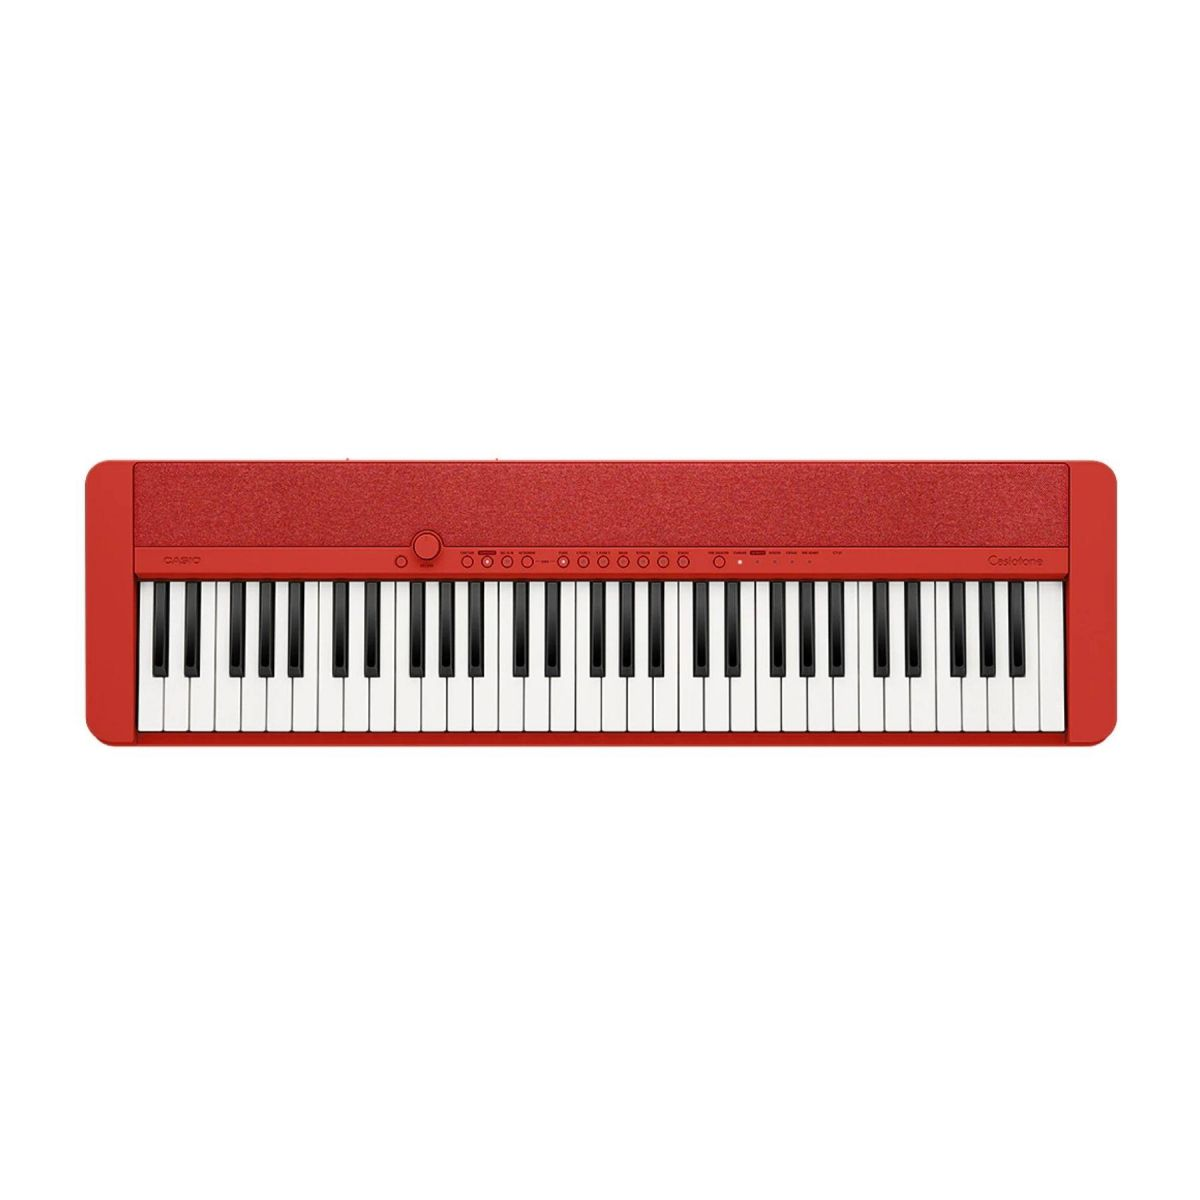 Tastiera Arranger Casio CT-S1 61 tasti red